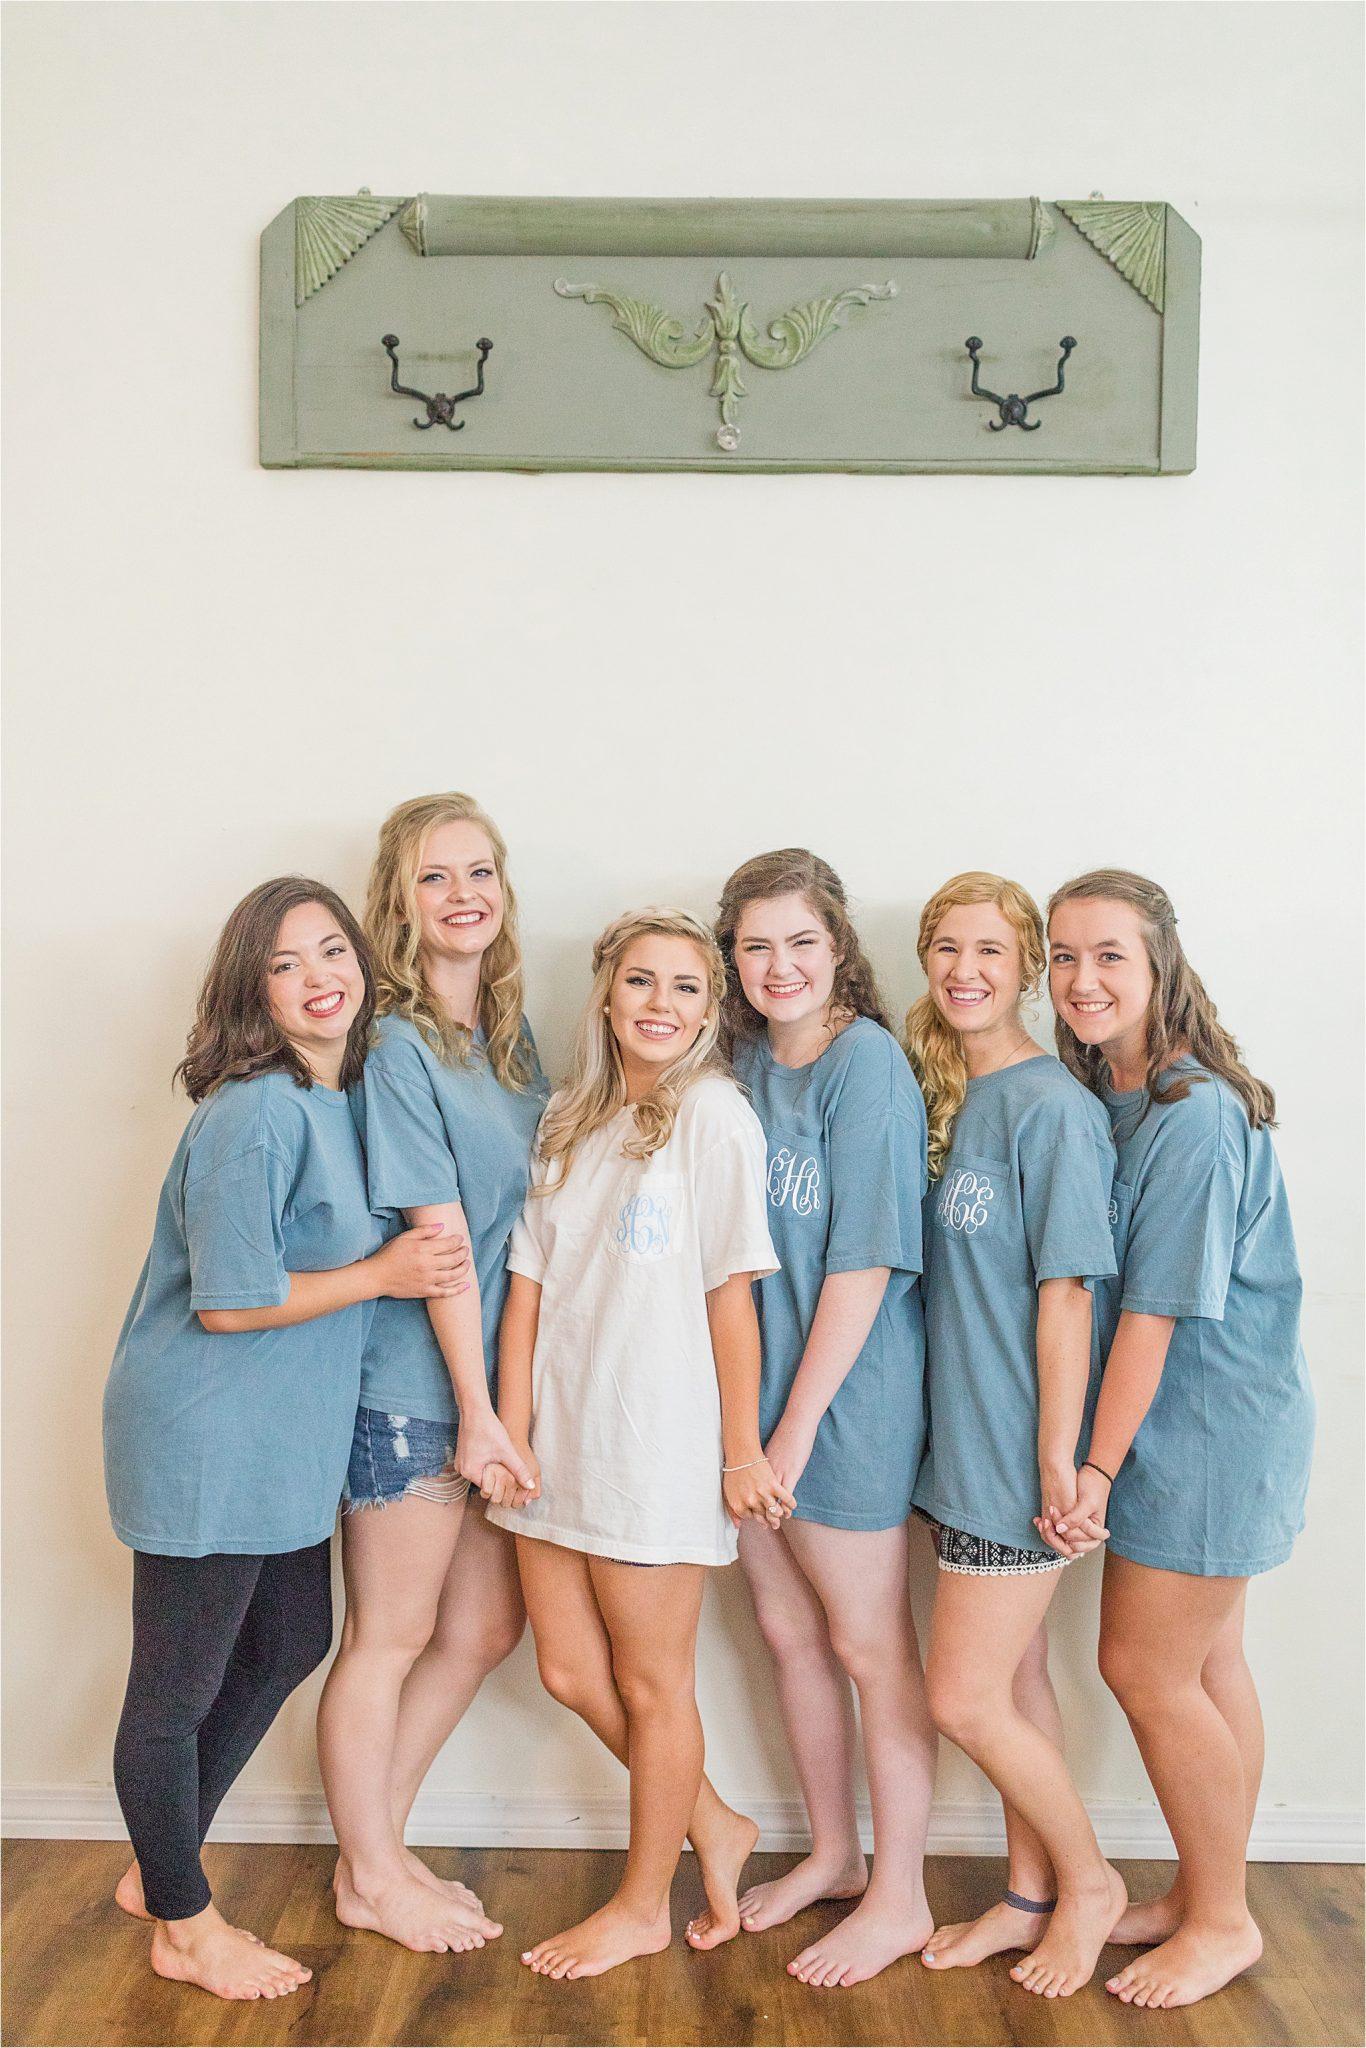 monogrammed-bridesmaid-tshirts-bridal-dusty-blue-light-periwinkle-comfy-color